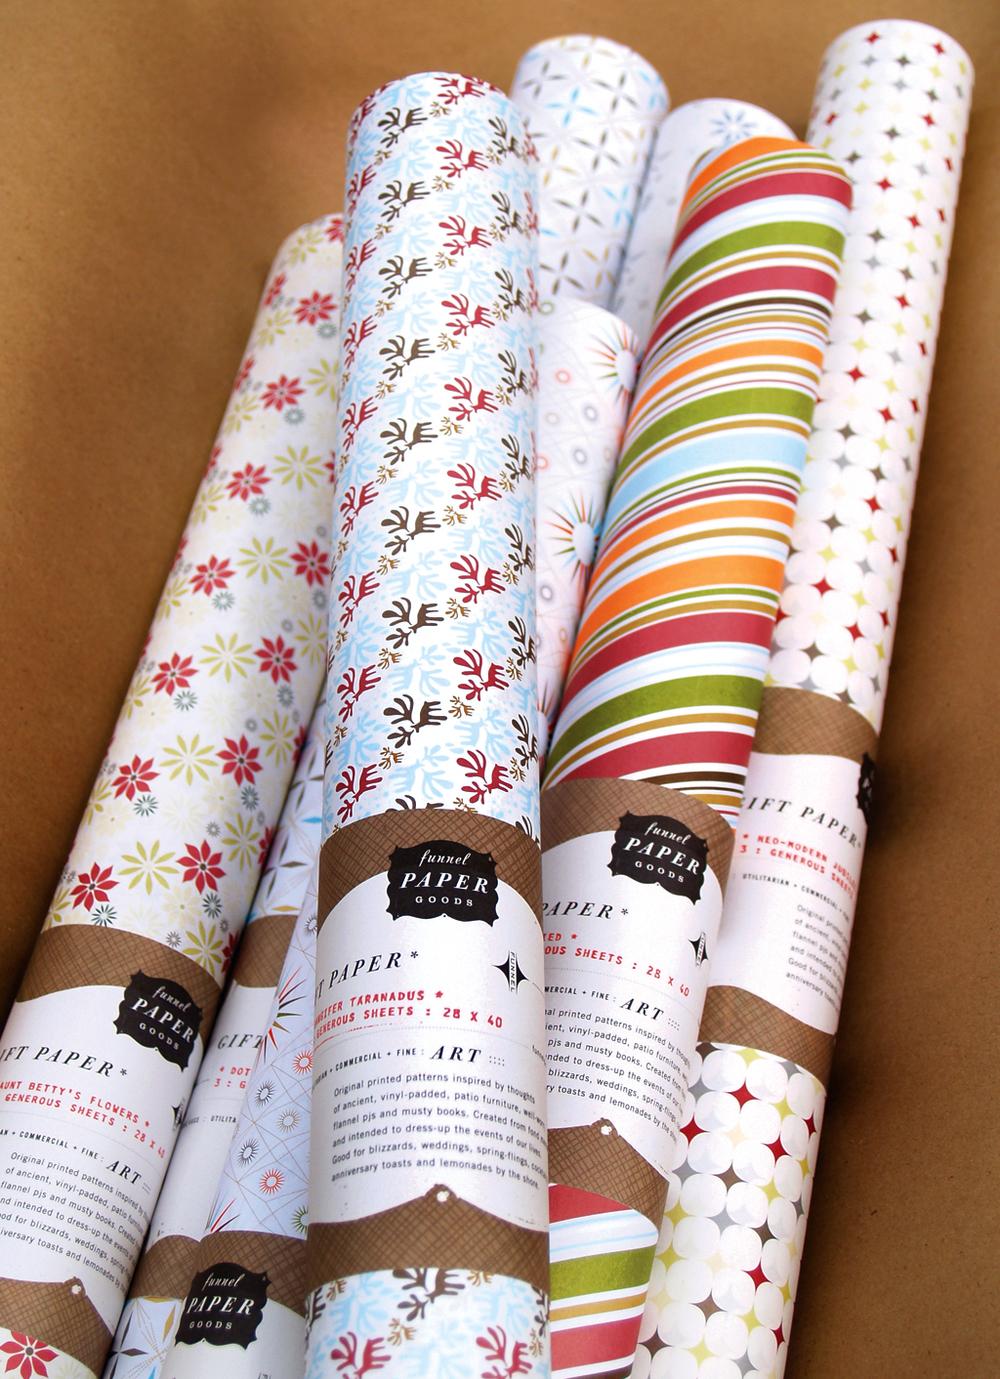 Funnel Paper Goods